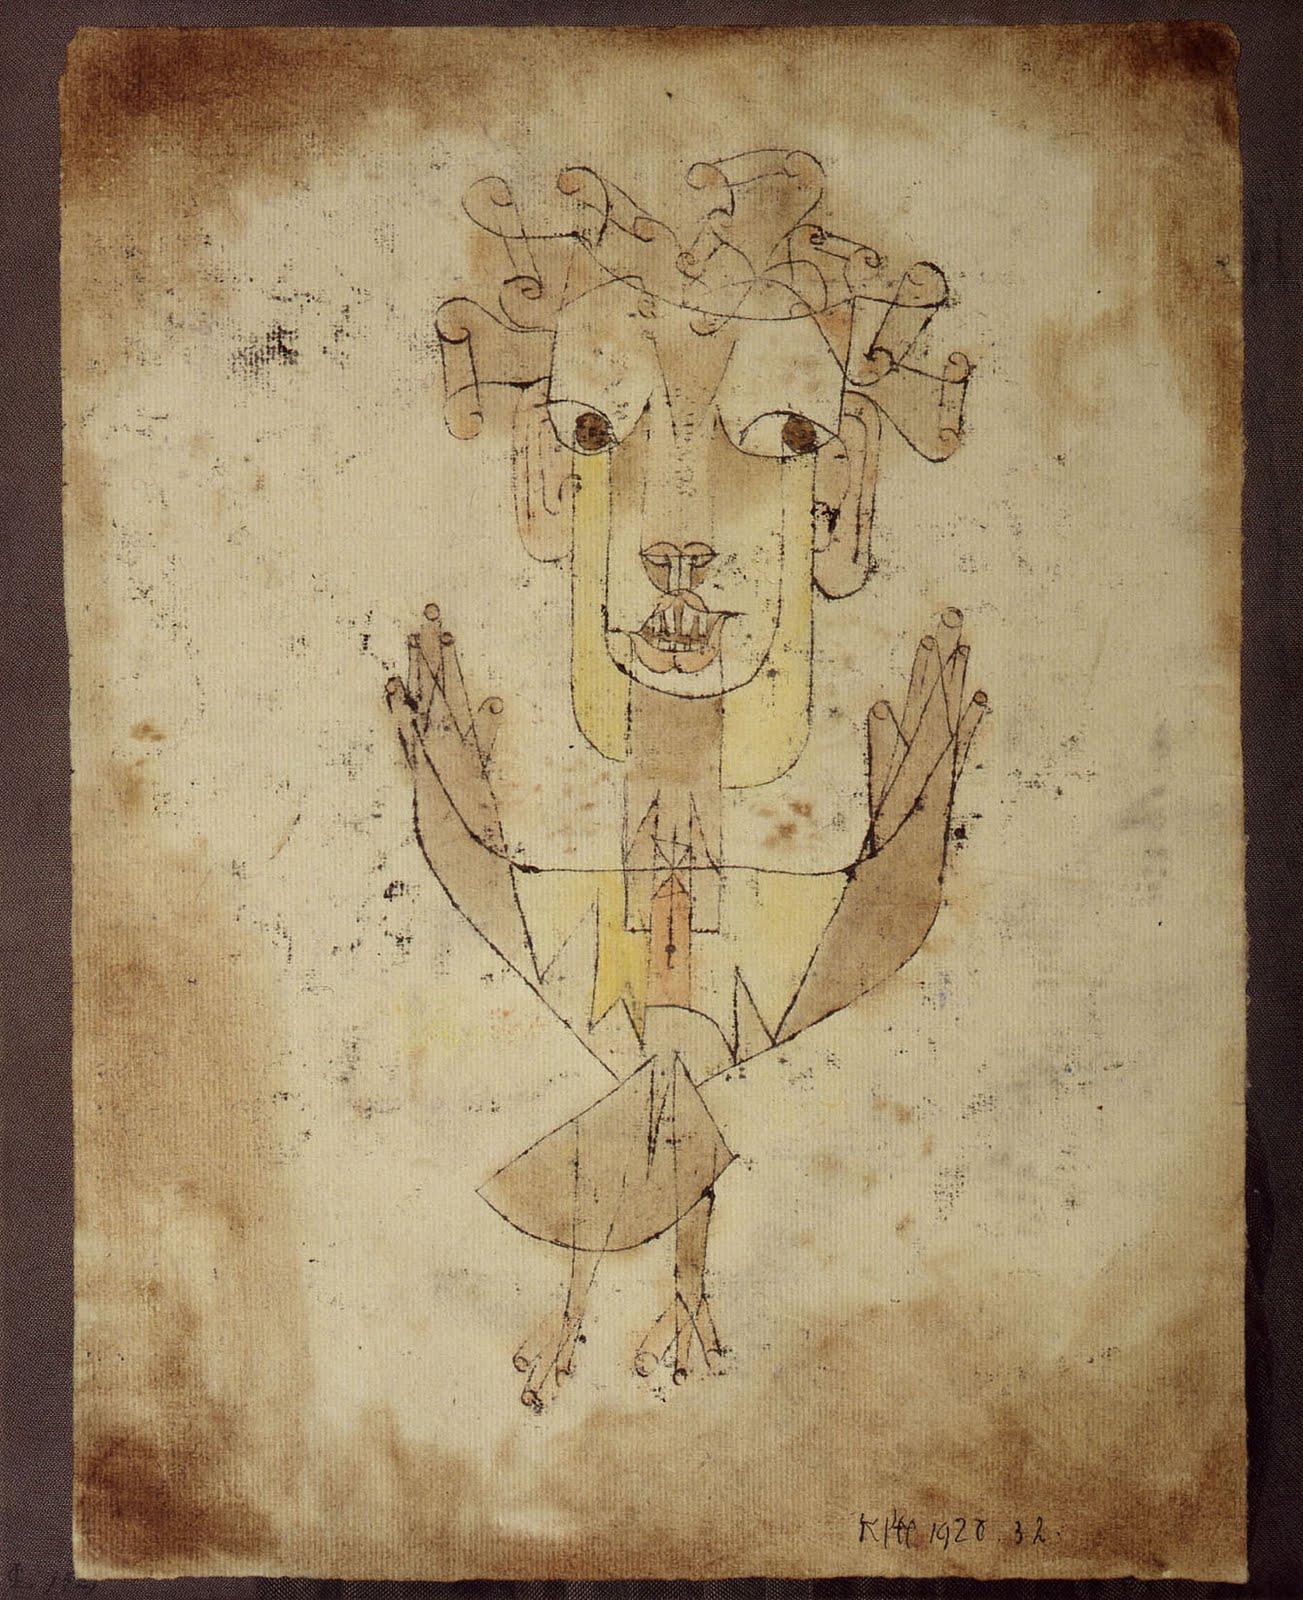 Bruno Arpaia [Italie] Paul-klee-angelus-novus